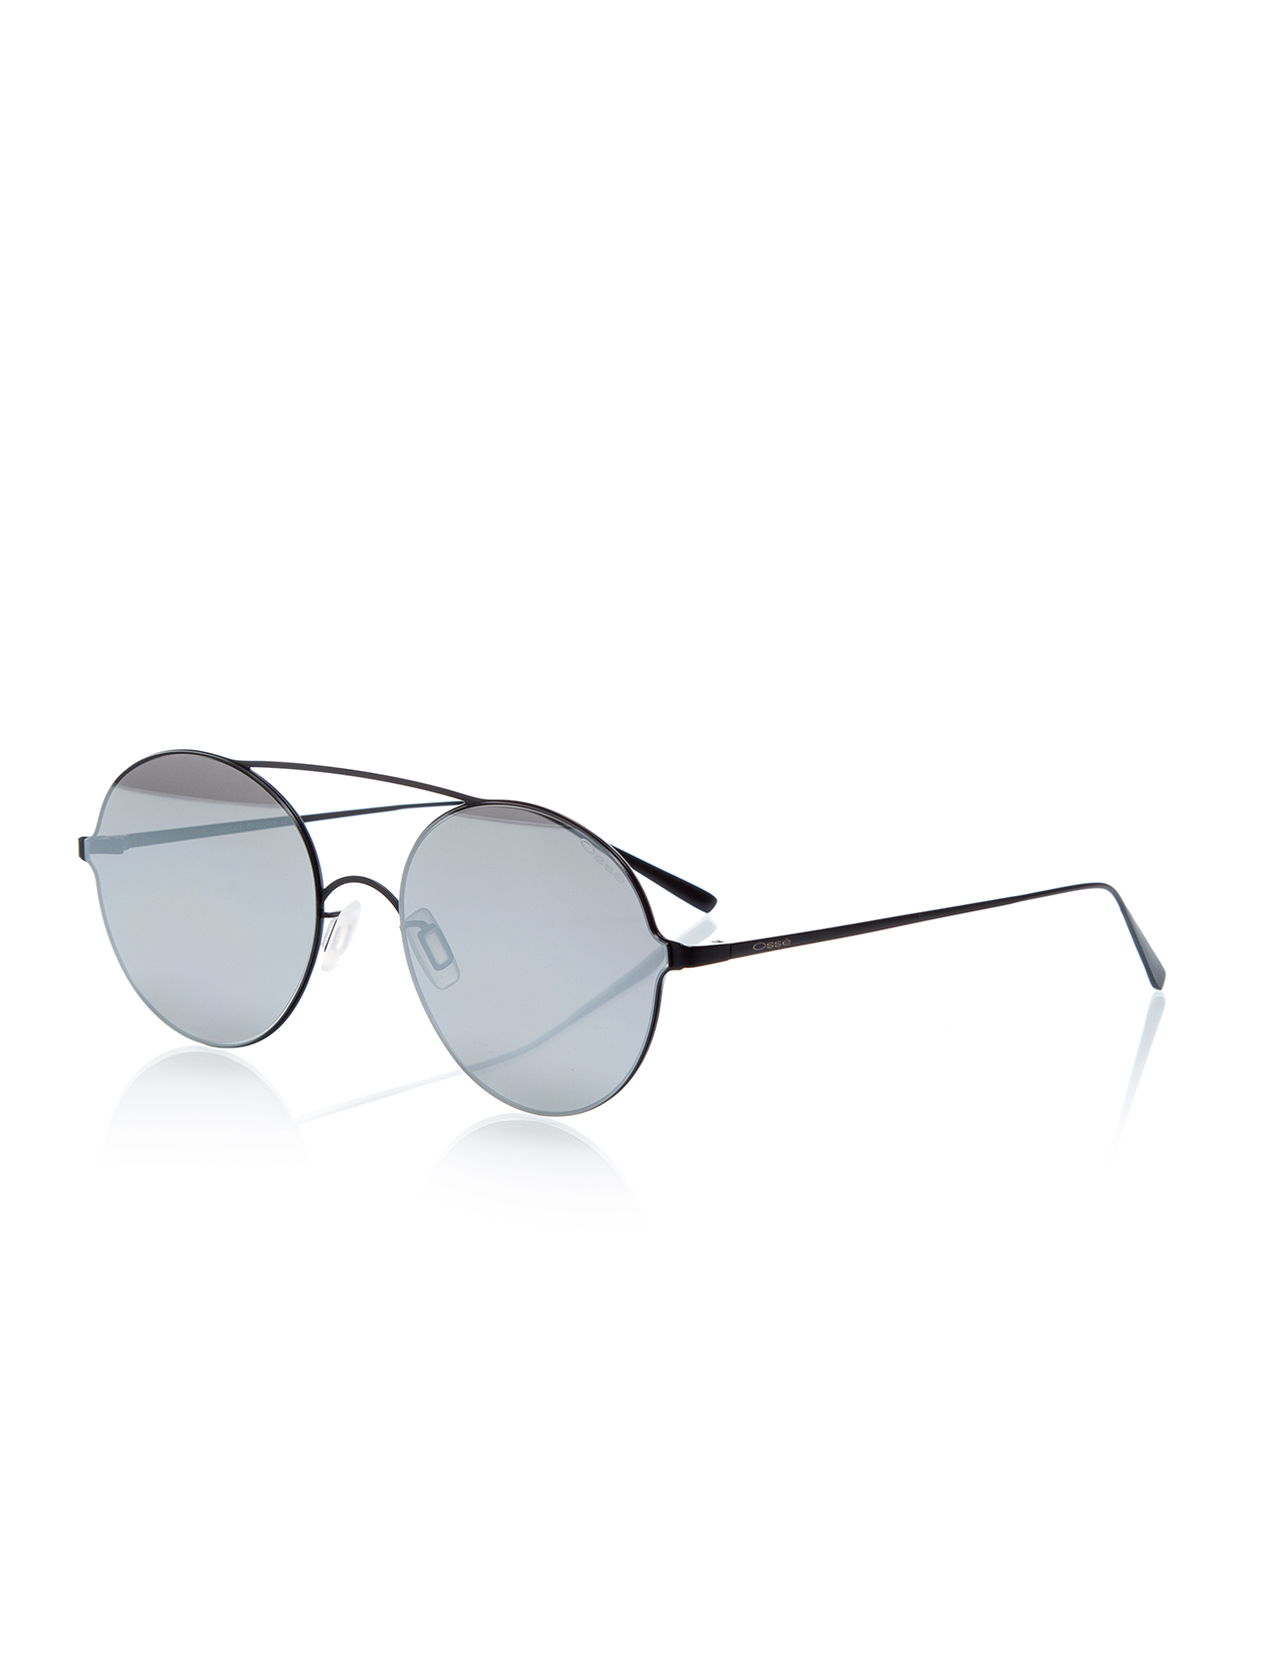 Unisex Metal Frame Sunglasses